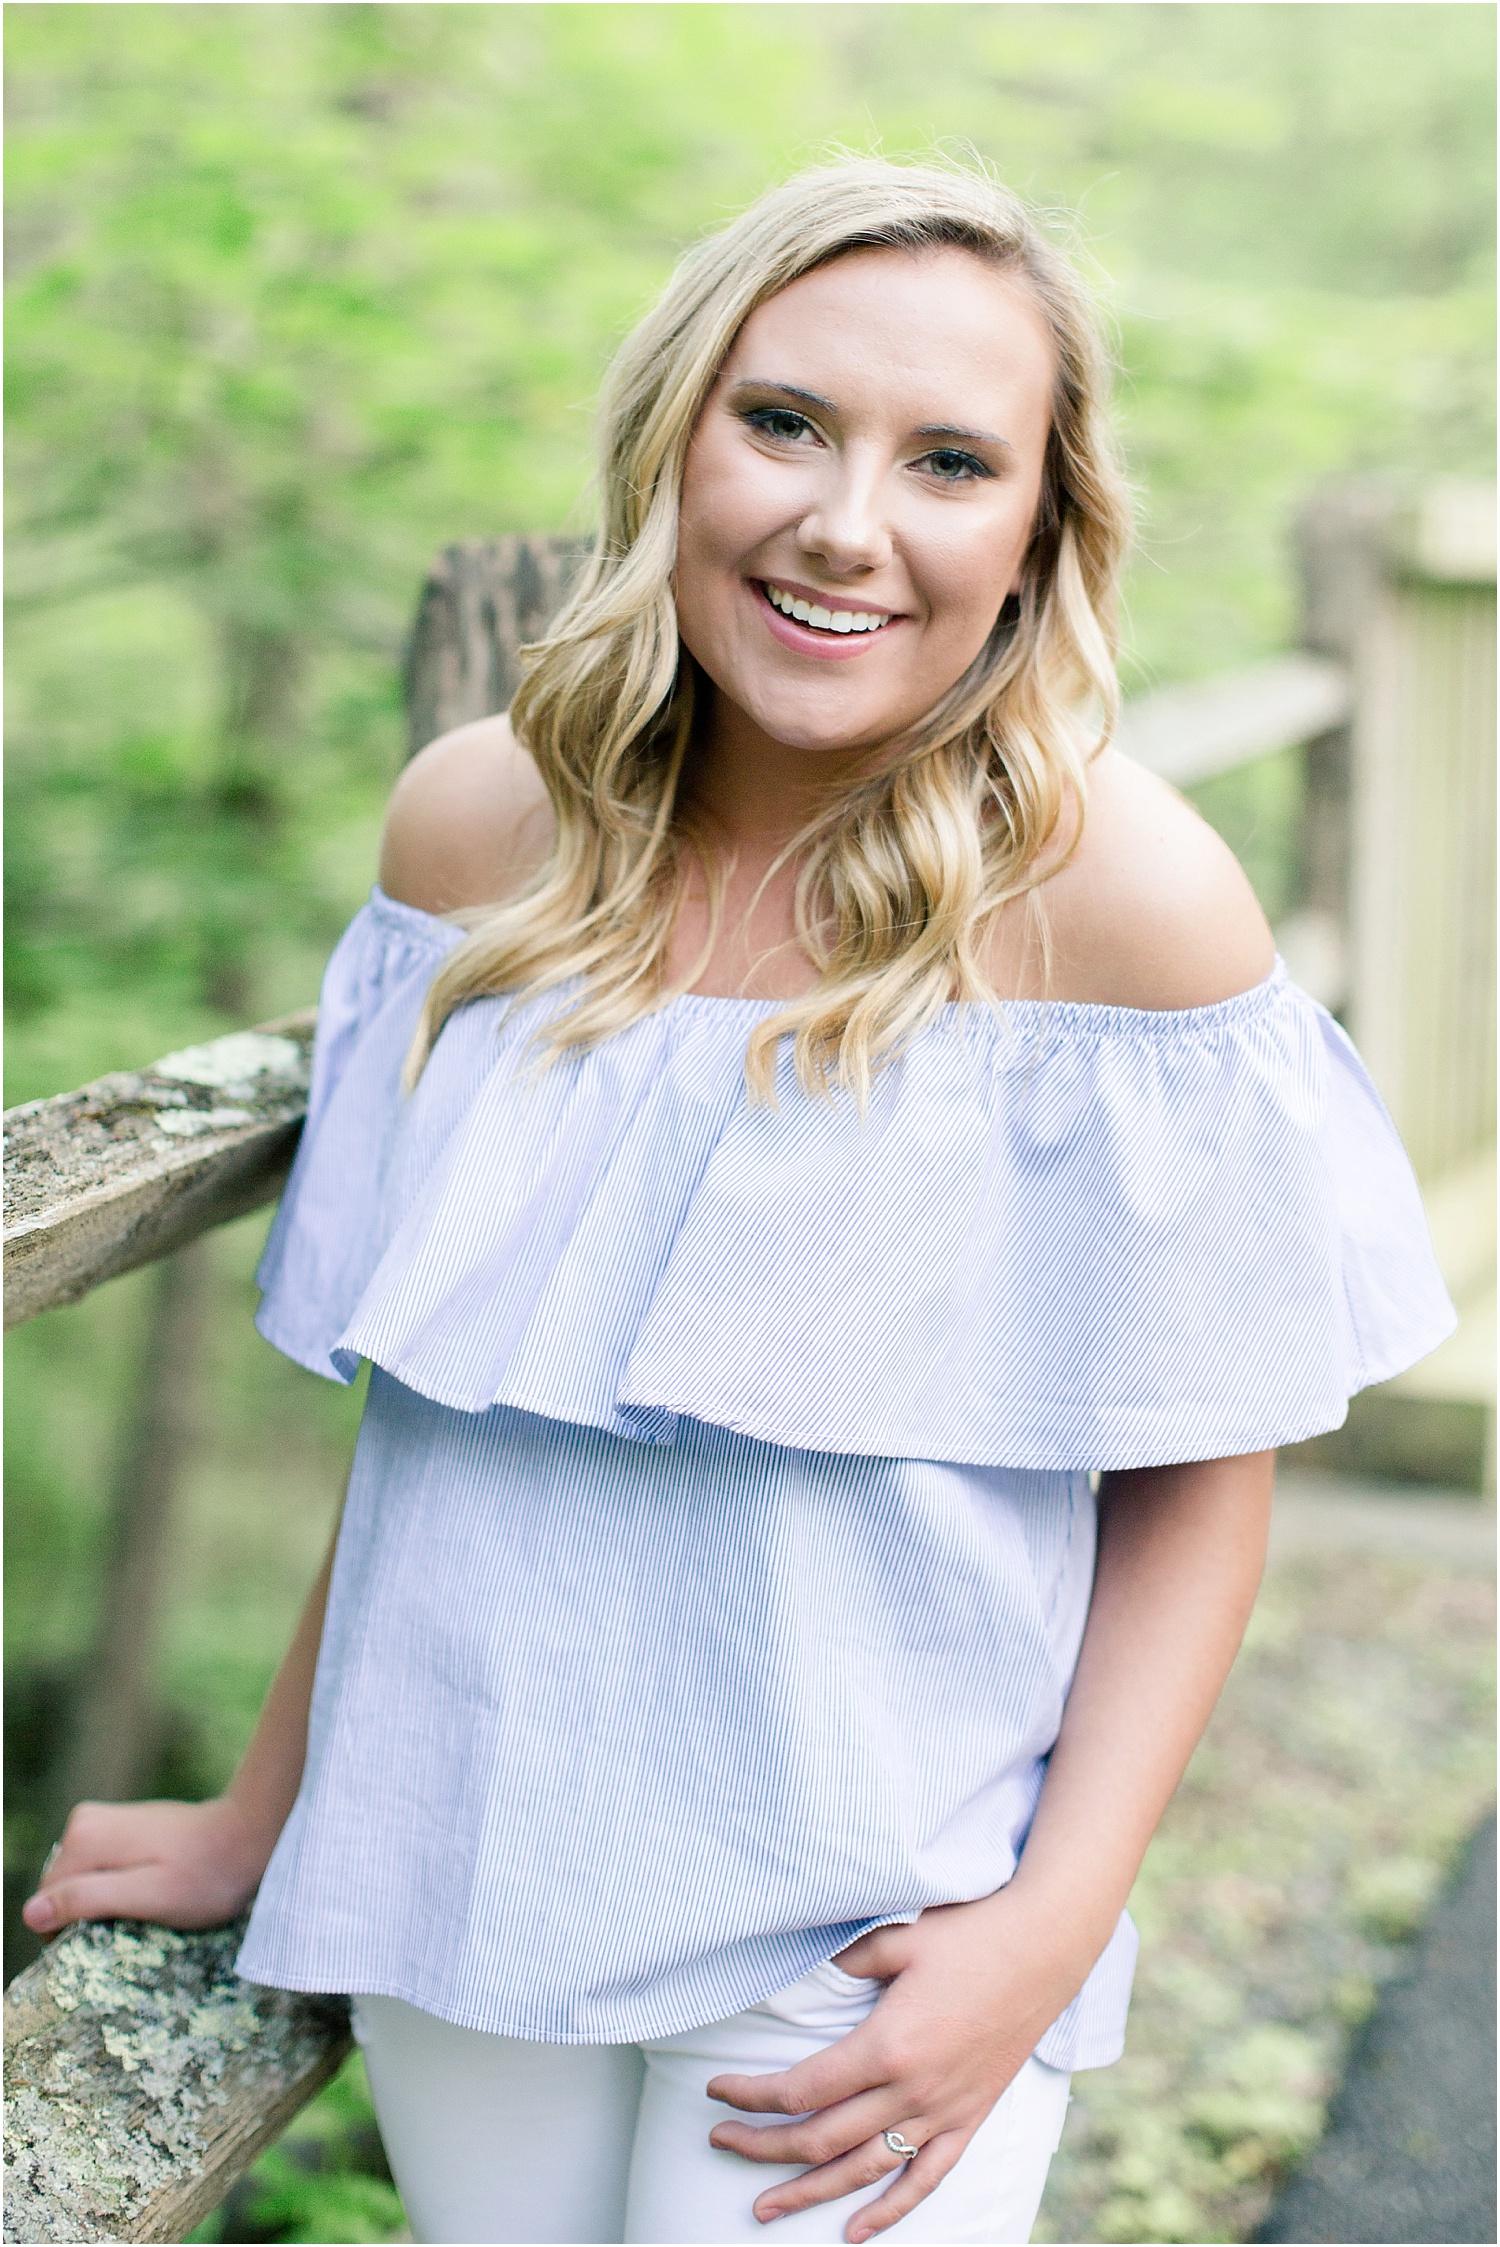 Senior Portrait Session | Ashley Powell Photography | Roanoke, VA Photographer | Radford University